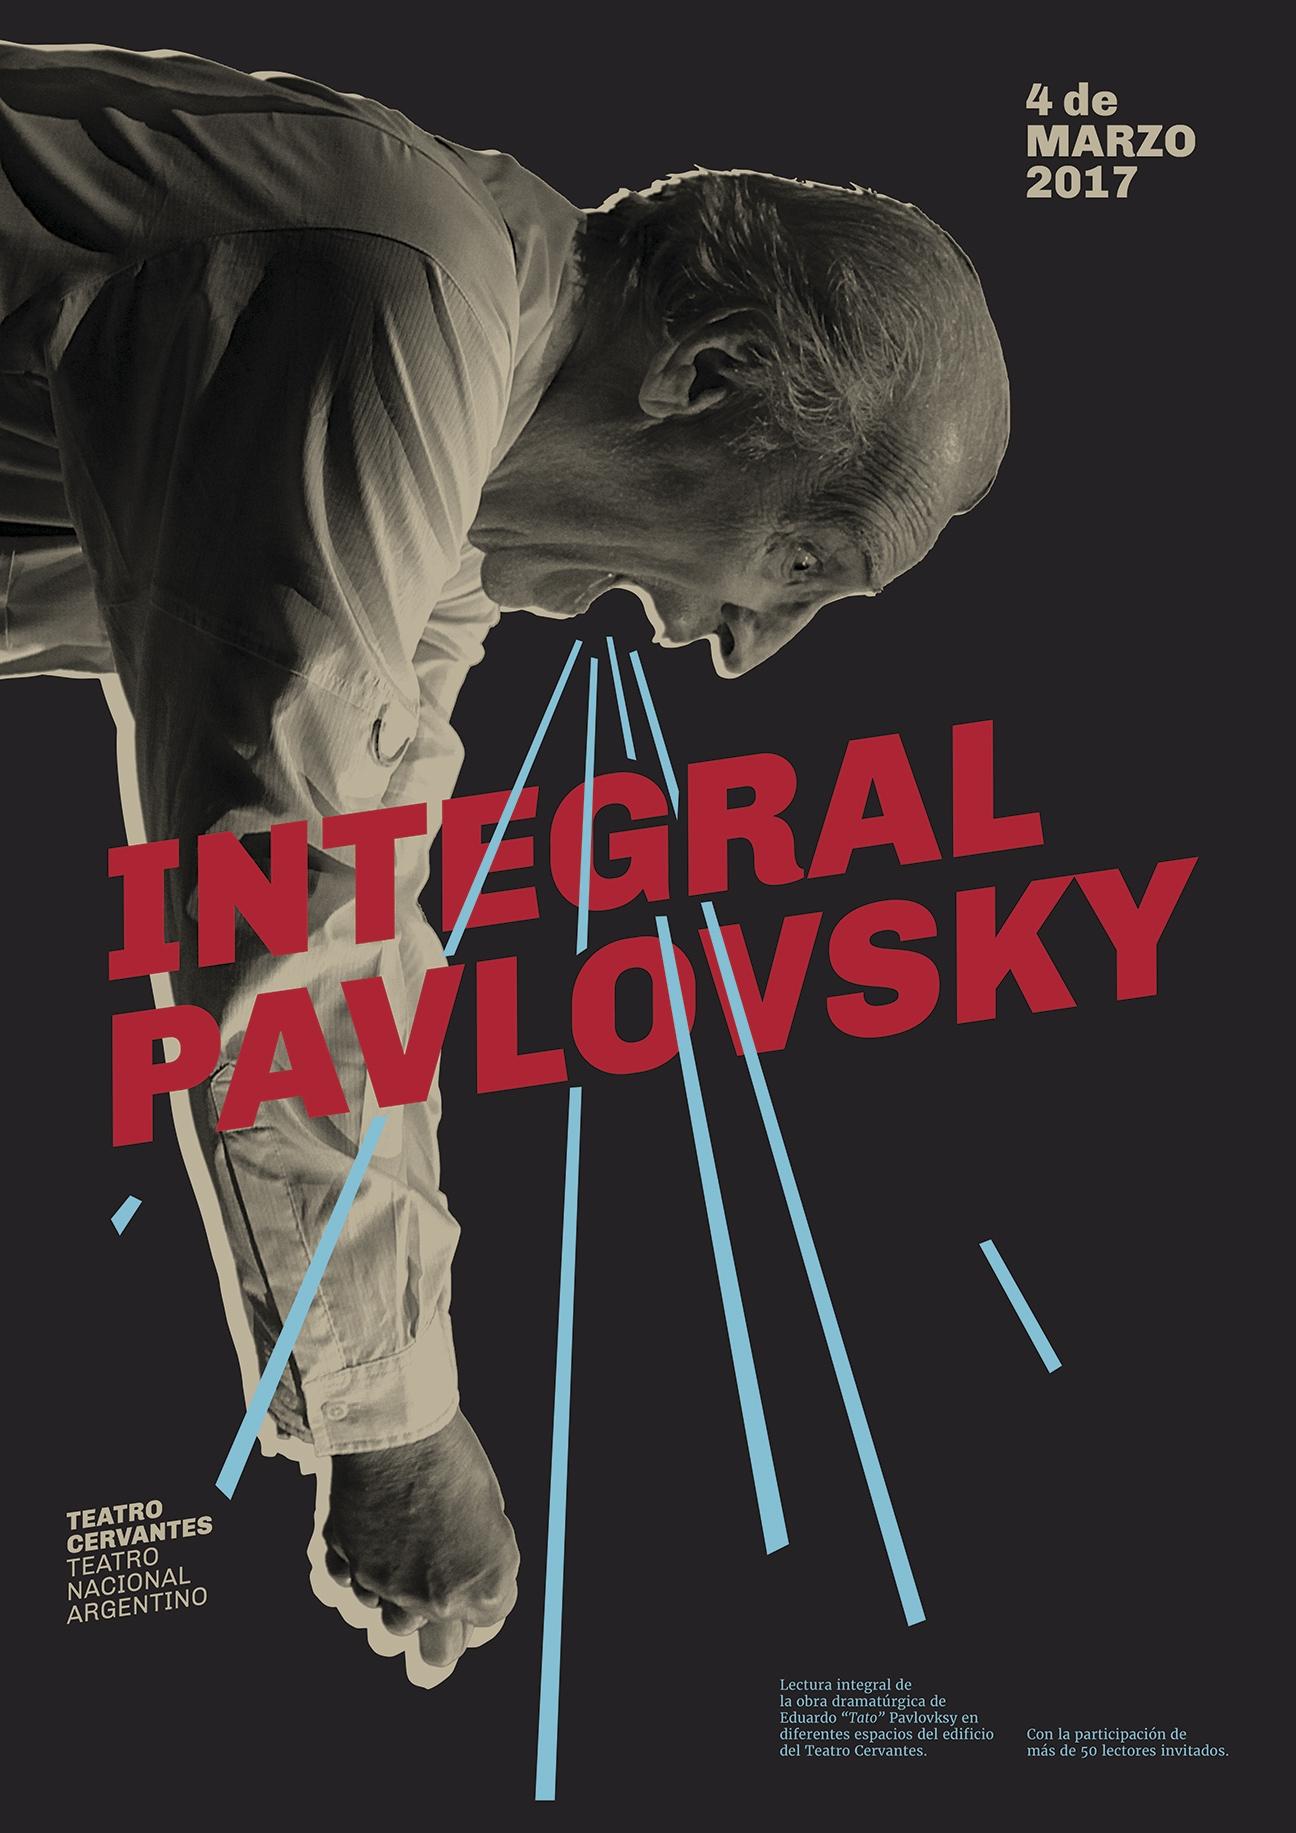 Diseño de afiches Teatro Cervantes - Teatro Nacional Argentino - Integral Pavlovsky